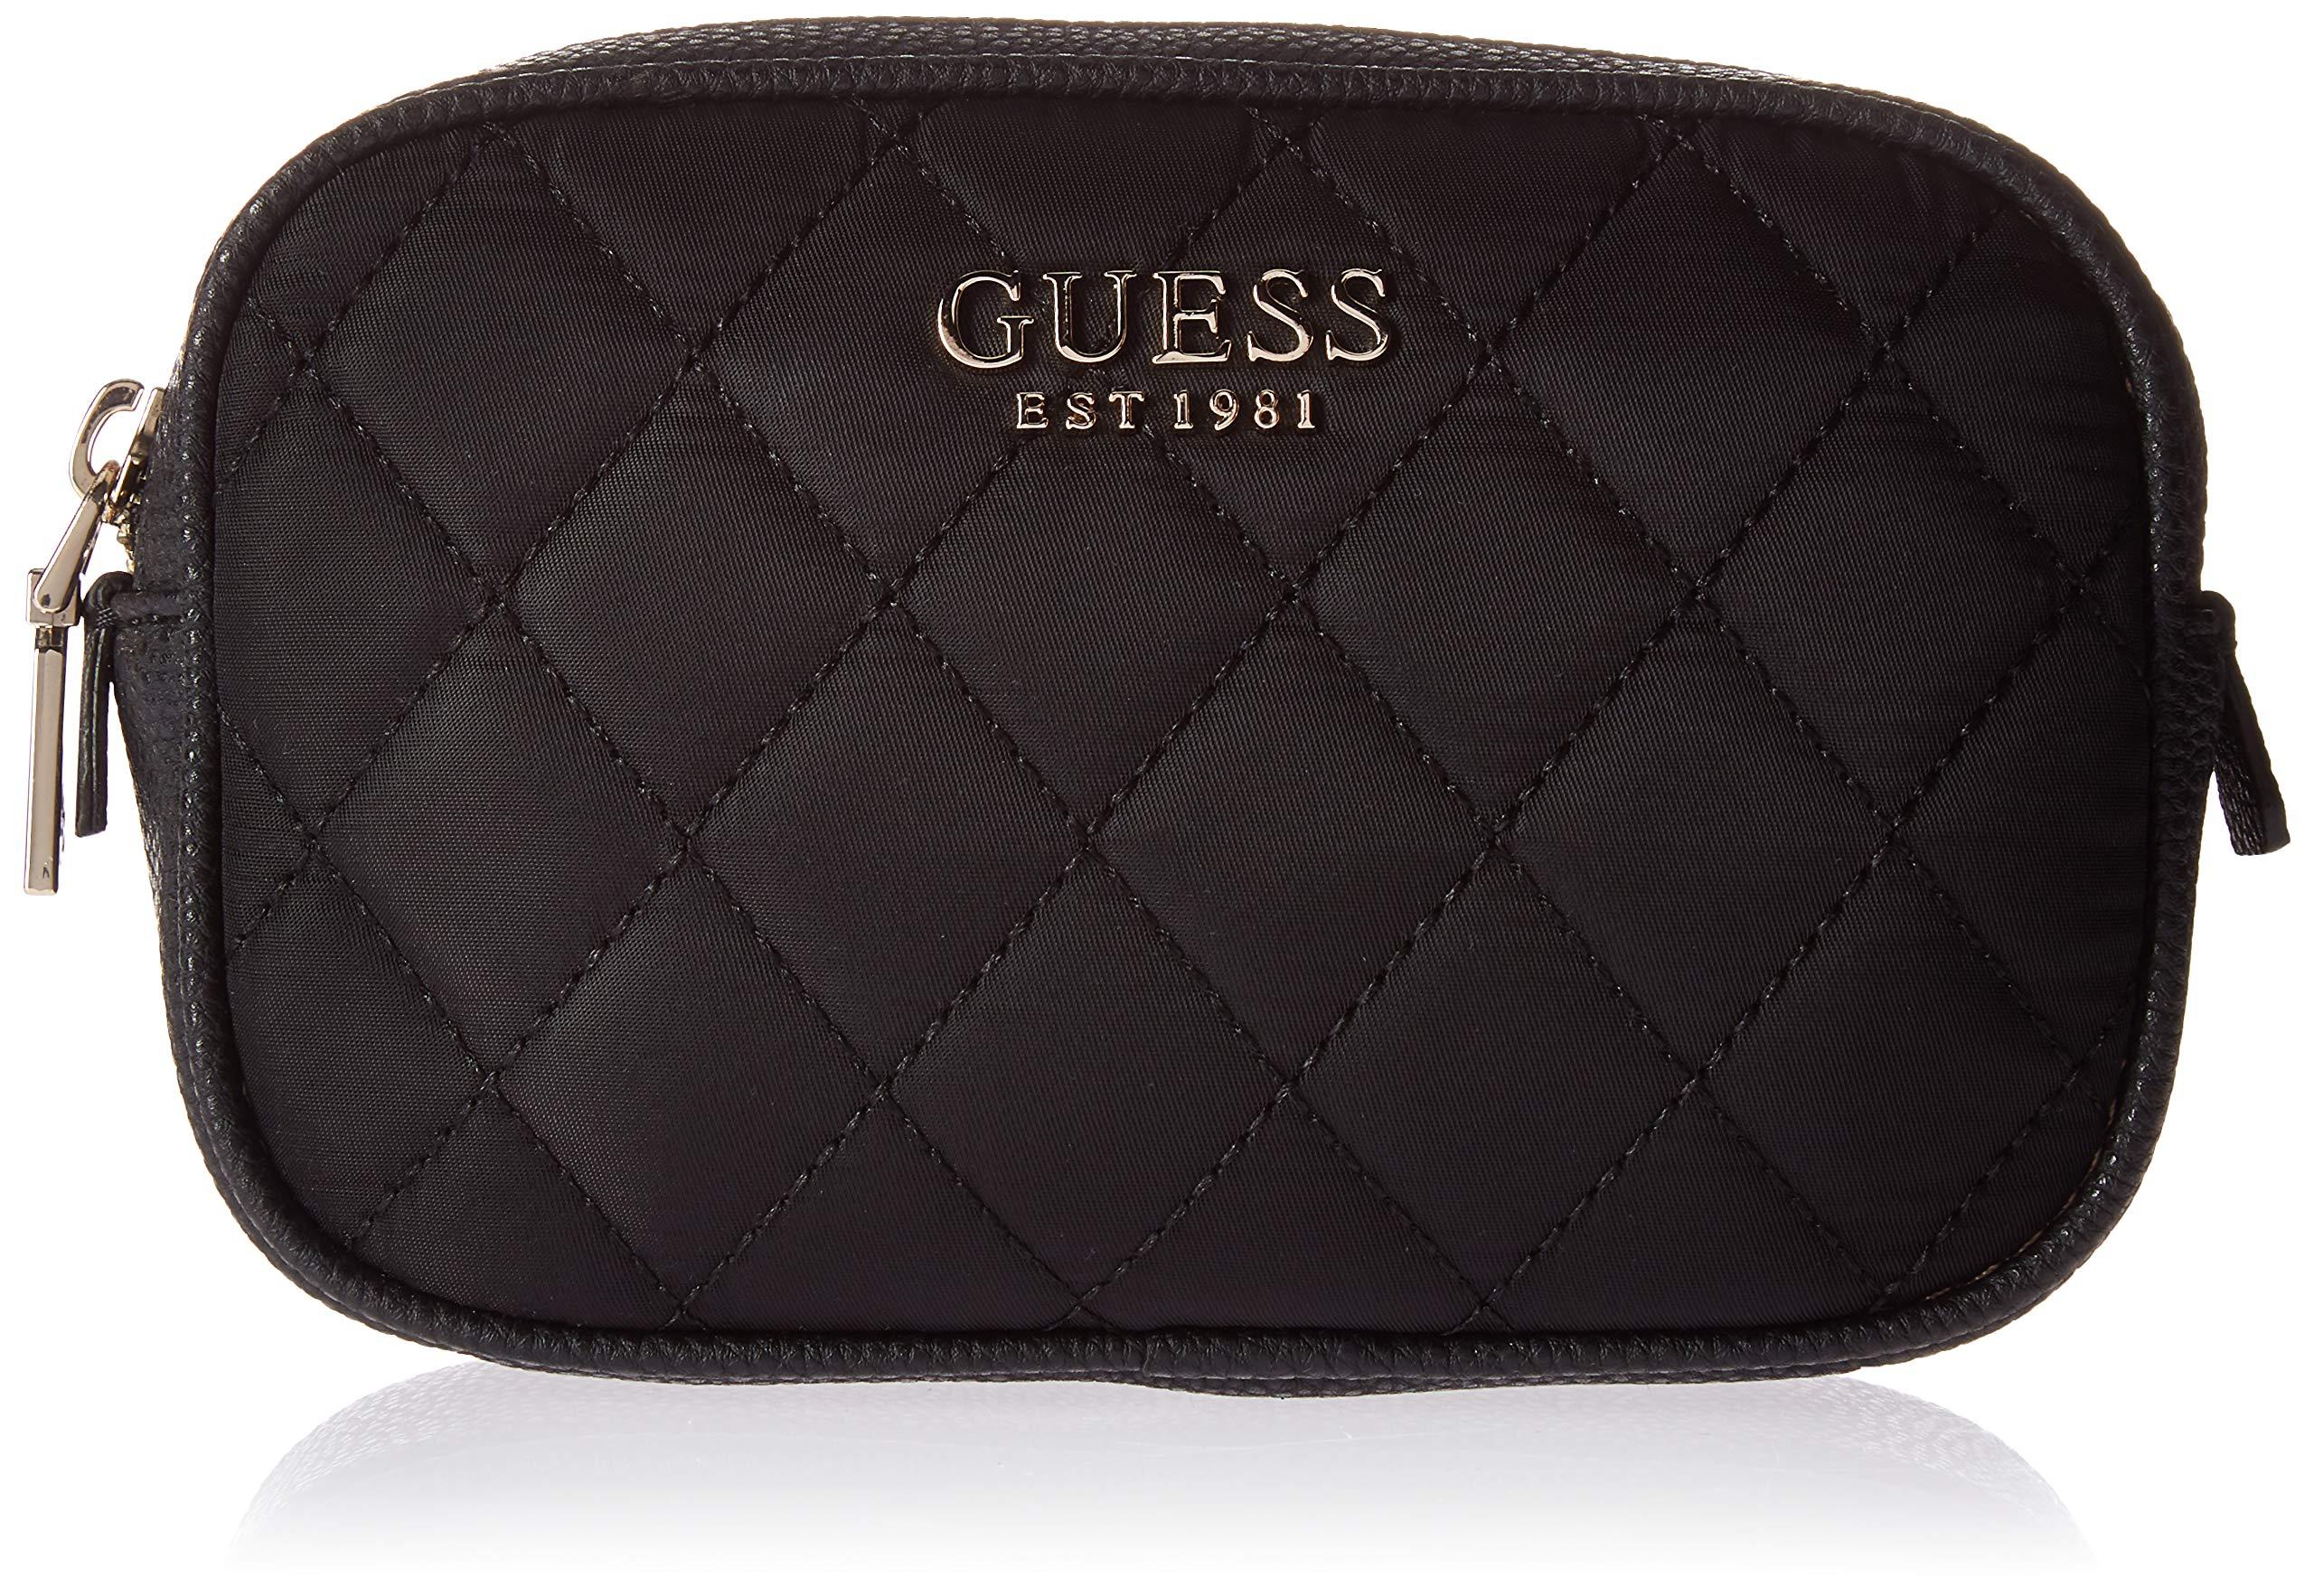 GUESS Sweet Candy Nylon Belt Bag,  Black, One Size